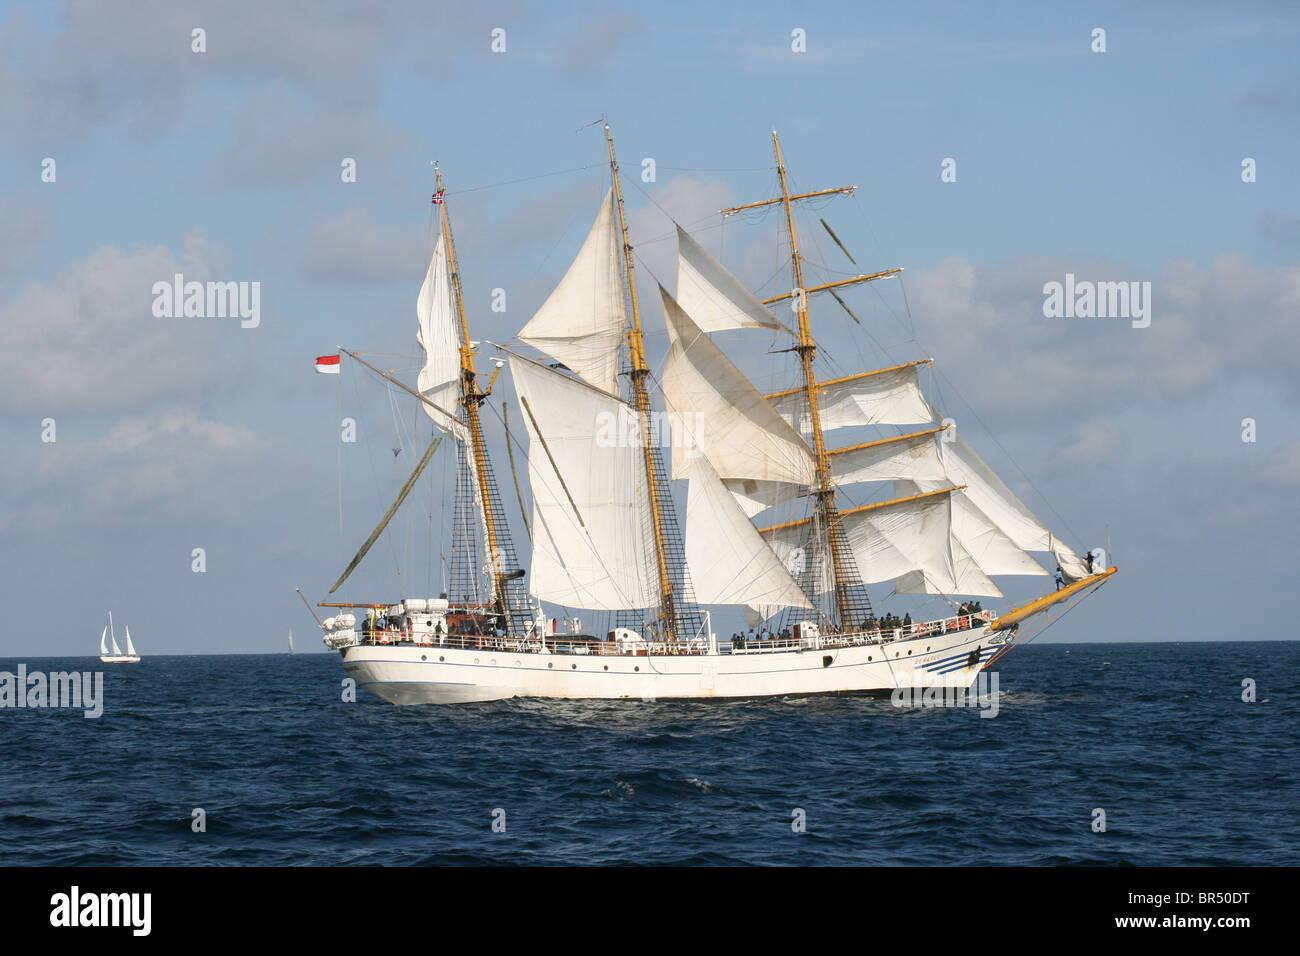 Dewaruci, The Tall Ships Races 2010, Kristiansand - Stock Image